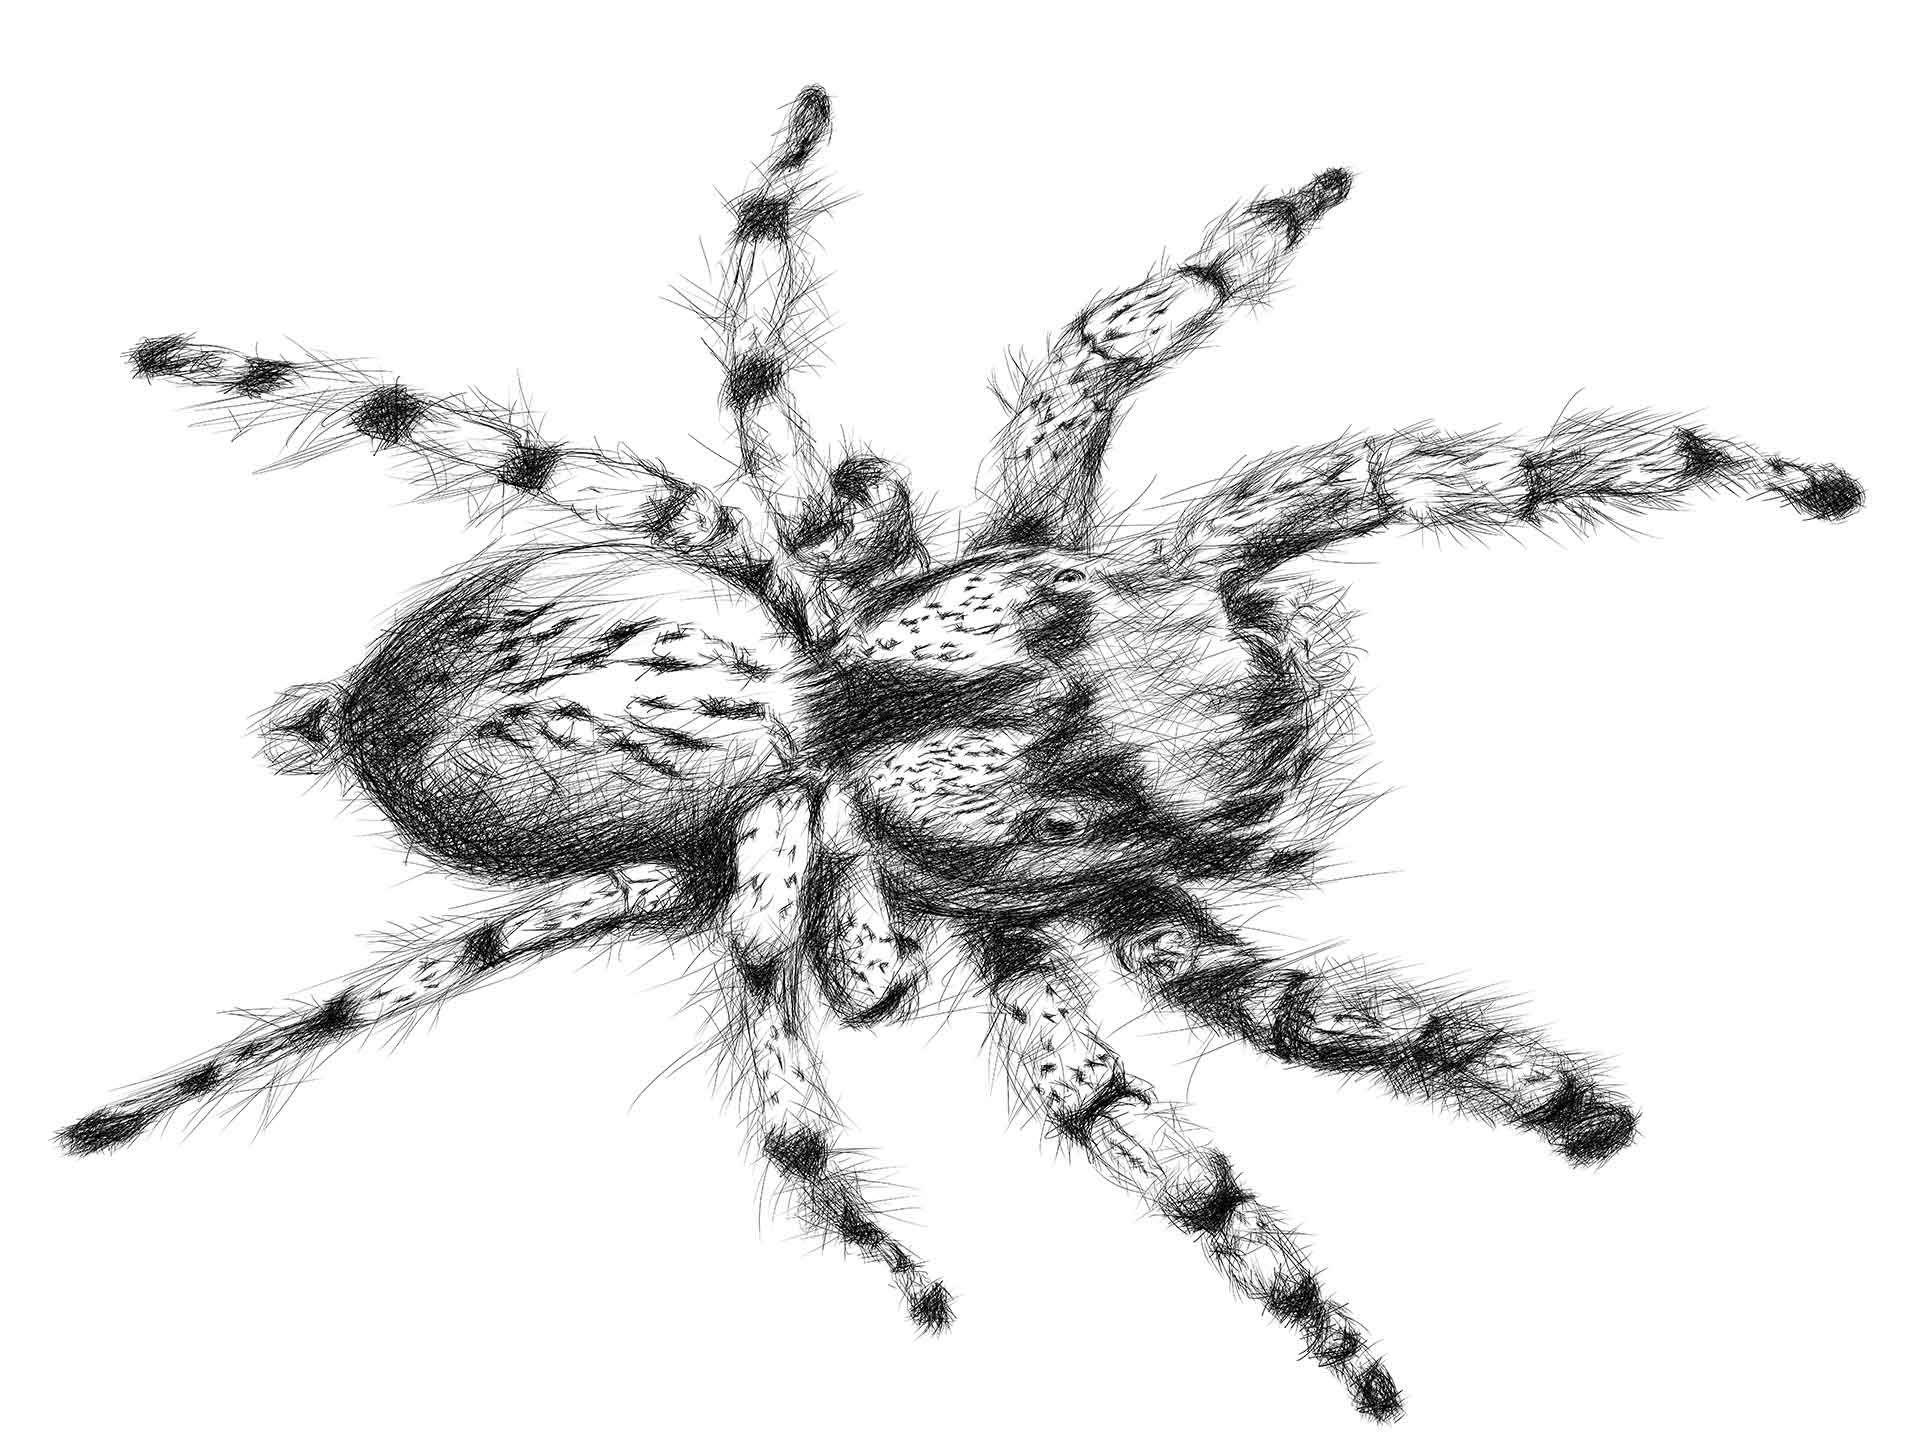 Hairy spider digital pencil line drawing ציור בעיפרון דיגיטלי עכביש